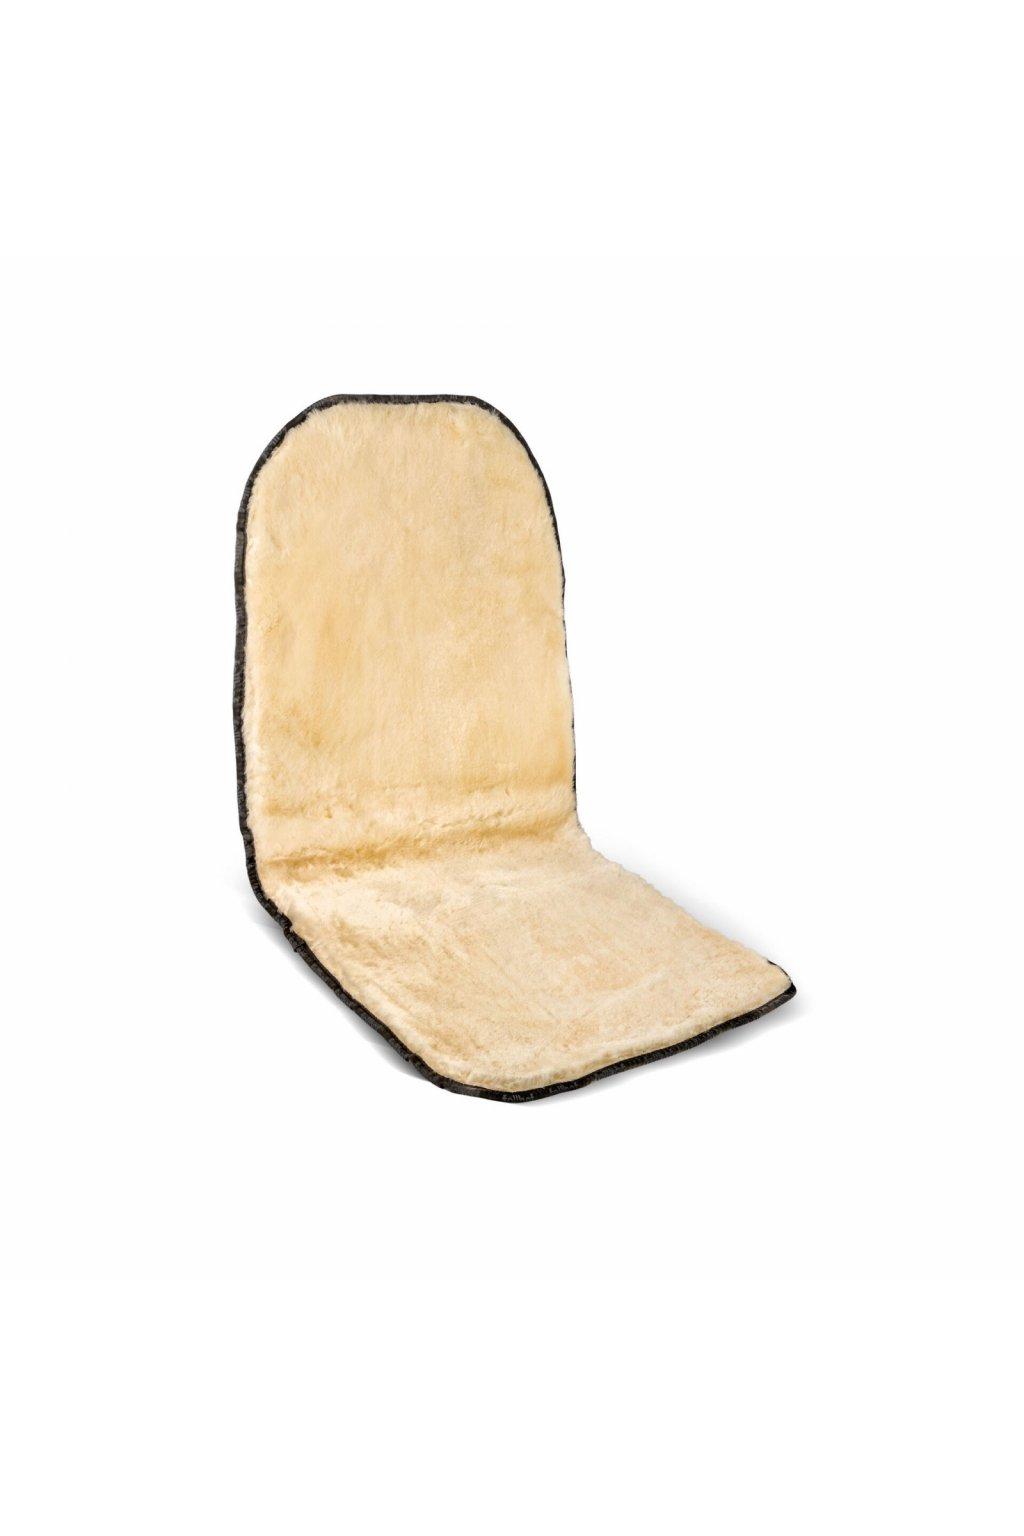 Lammfell Stuhlauflagen UNIVERSAL beige 0